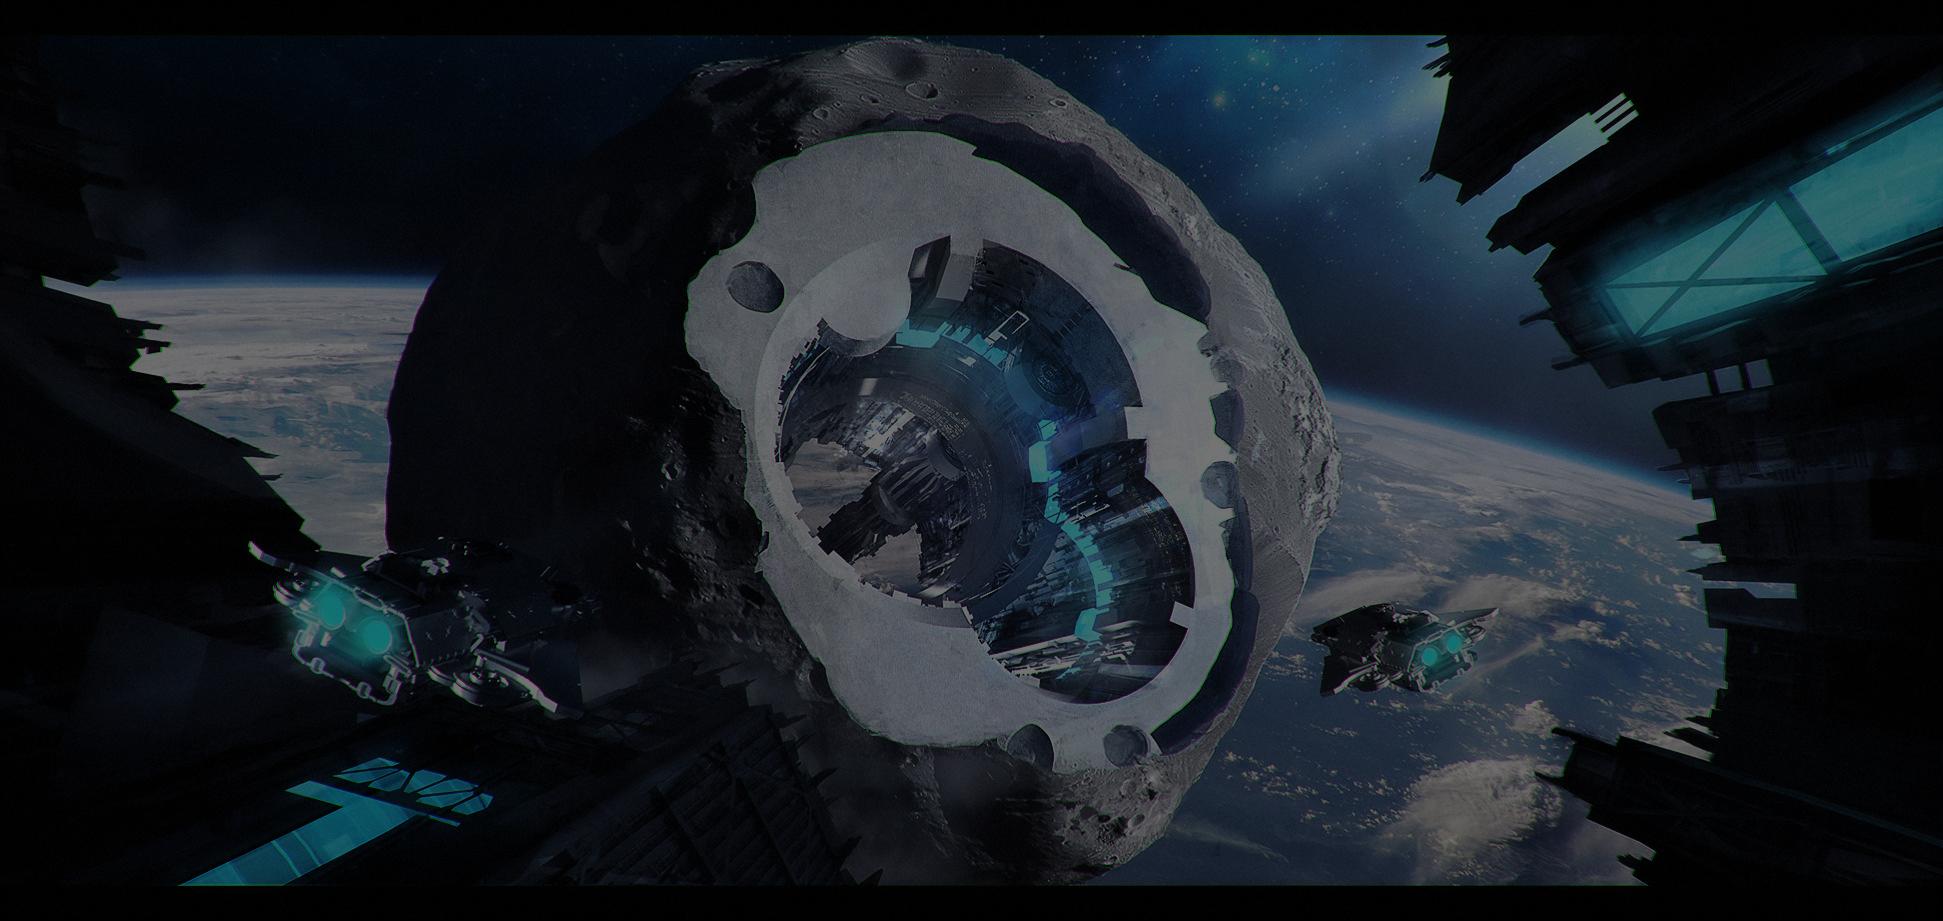 Asteroid Station (c) M. Drabik